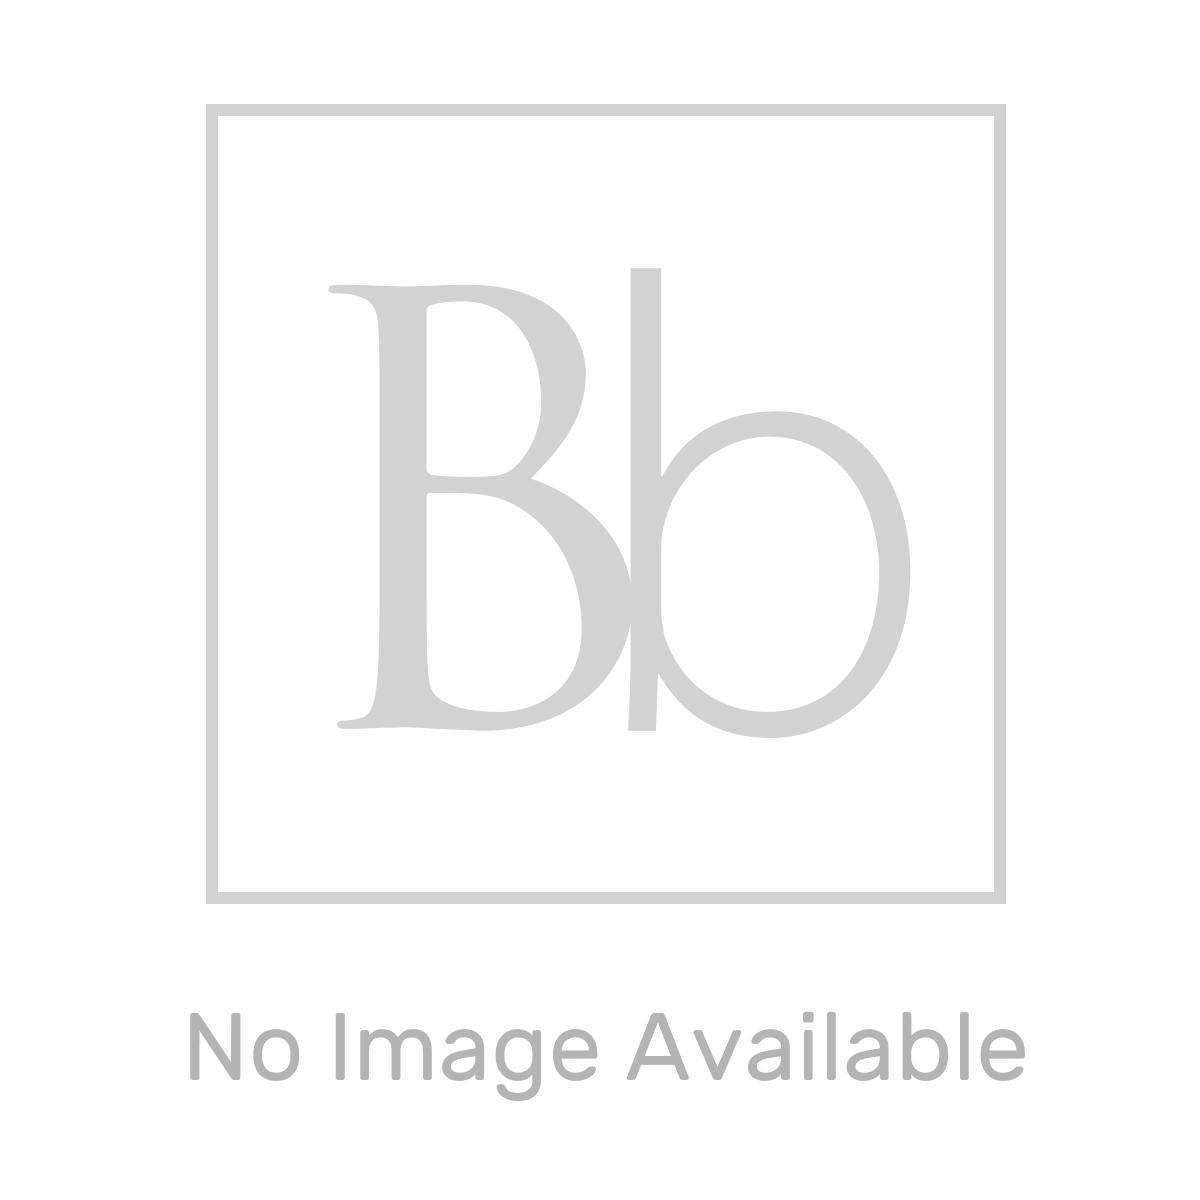 RAK Surface Outdoor Mid grey Matt Tile 600 x 600mm